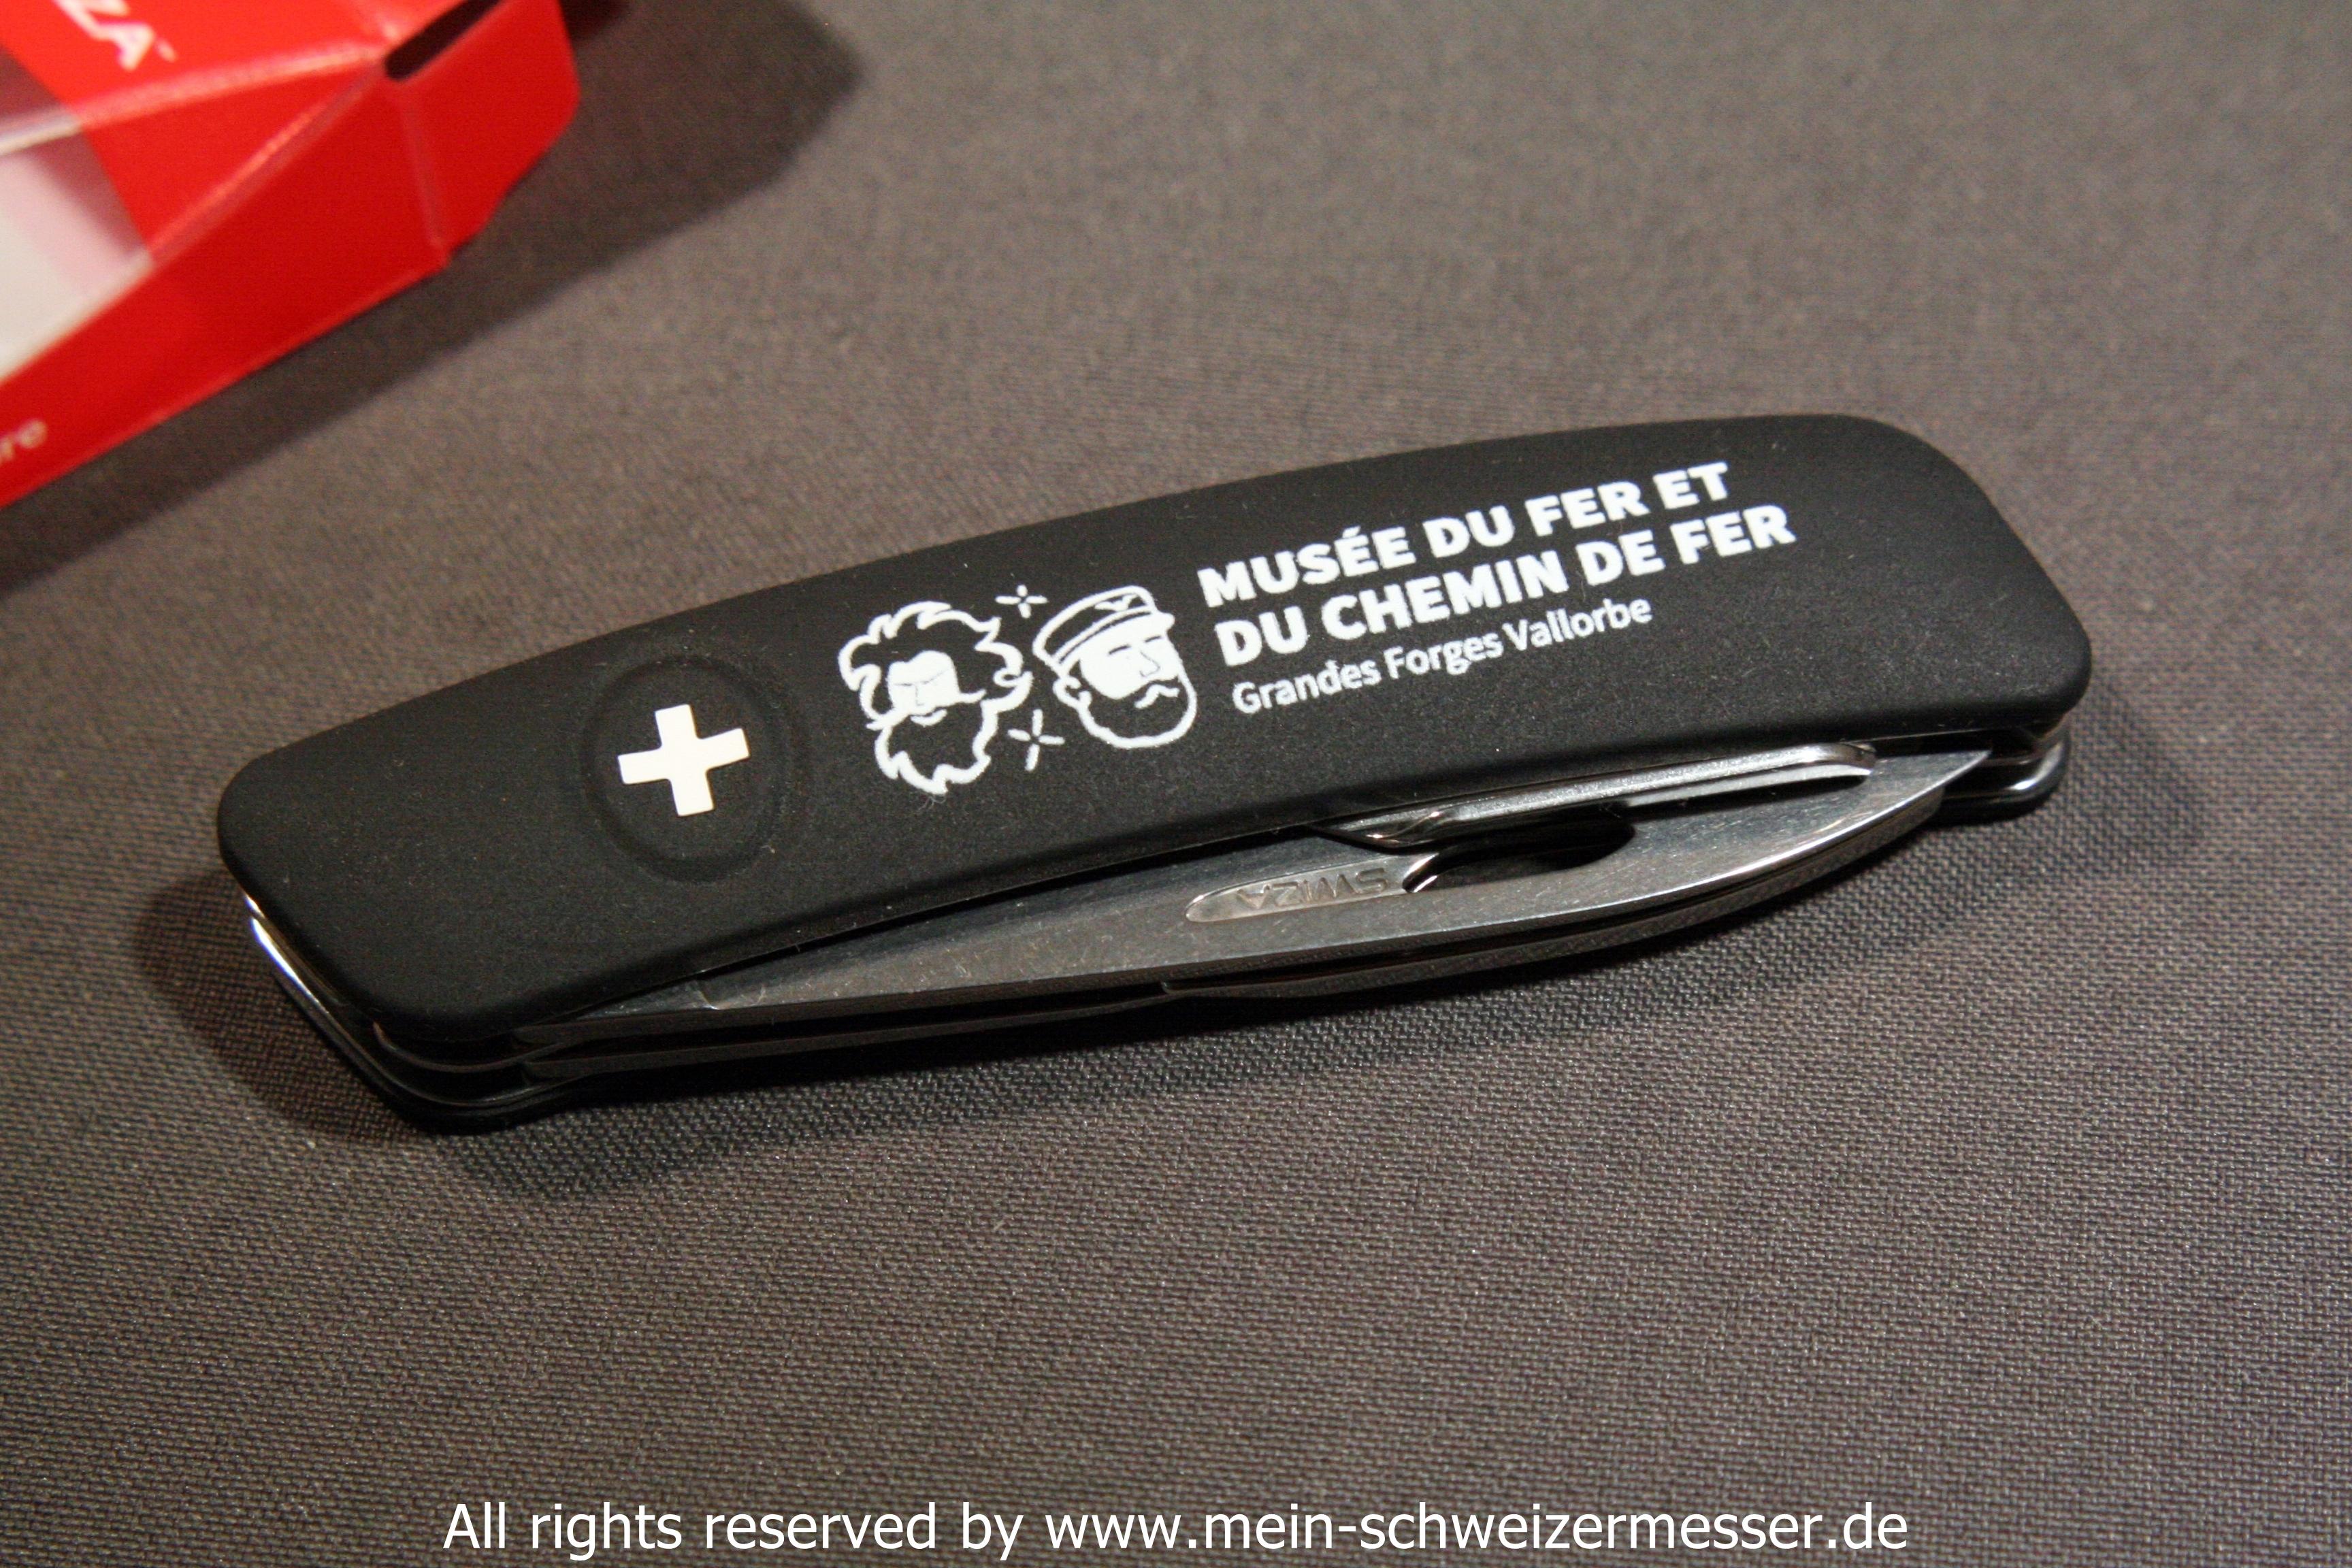 7794a807072 mein-schweizermesser - Swiss Army Knife SWIZA D03